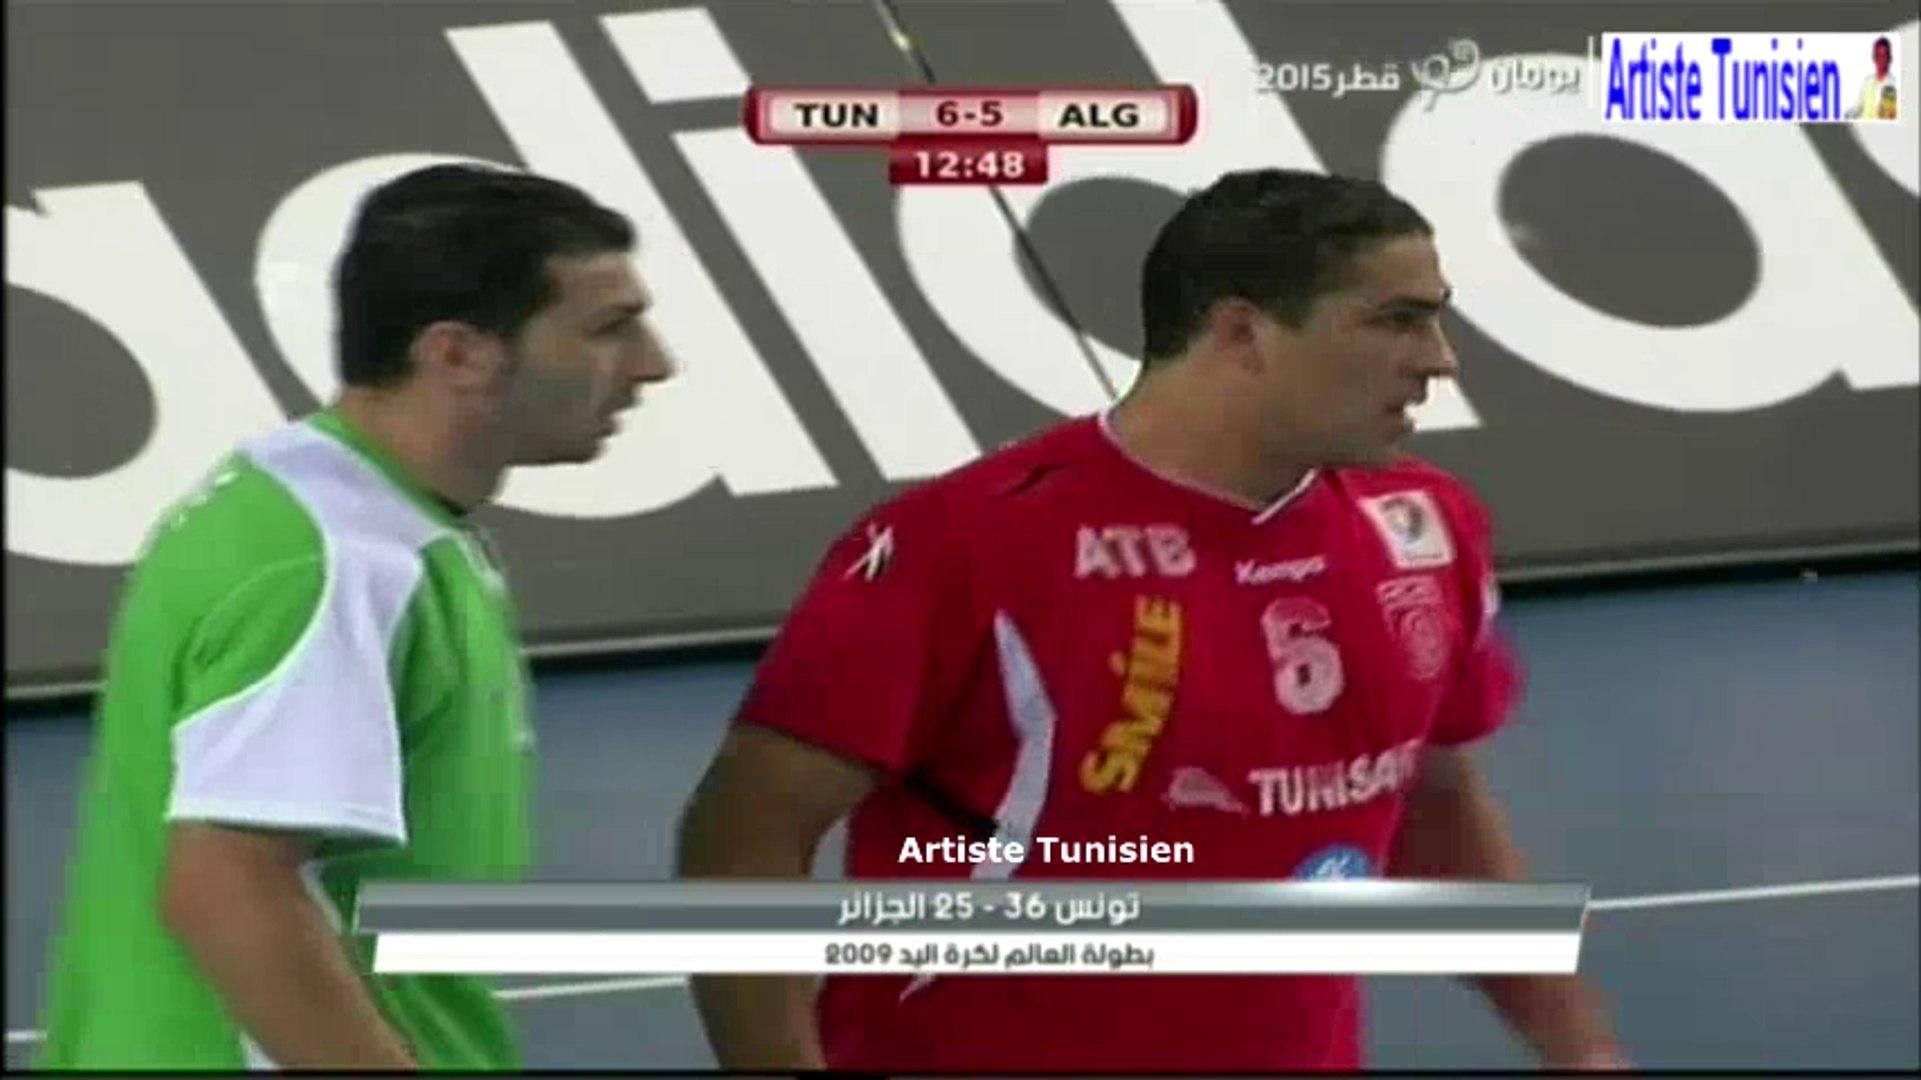 Match Handball Mondial 2009 Tunisie vs Algérie 22-01-2009 [Full Match Highlights]